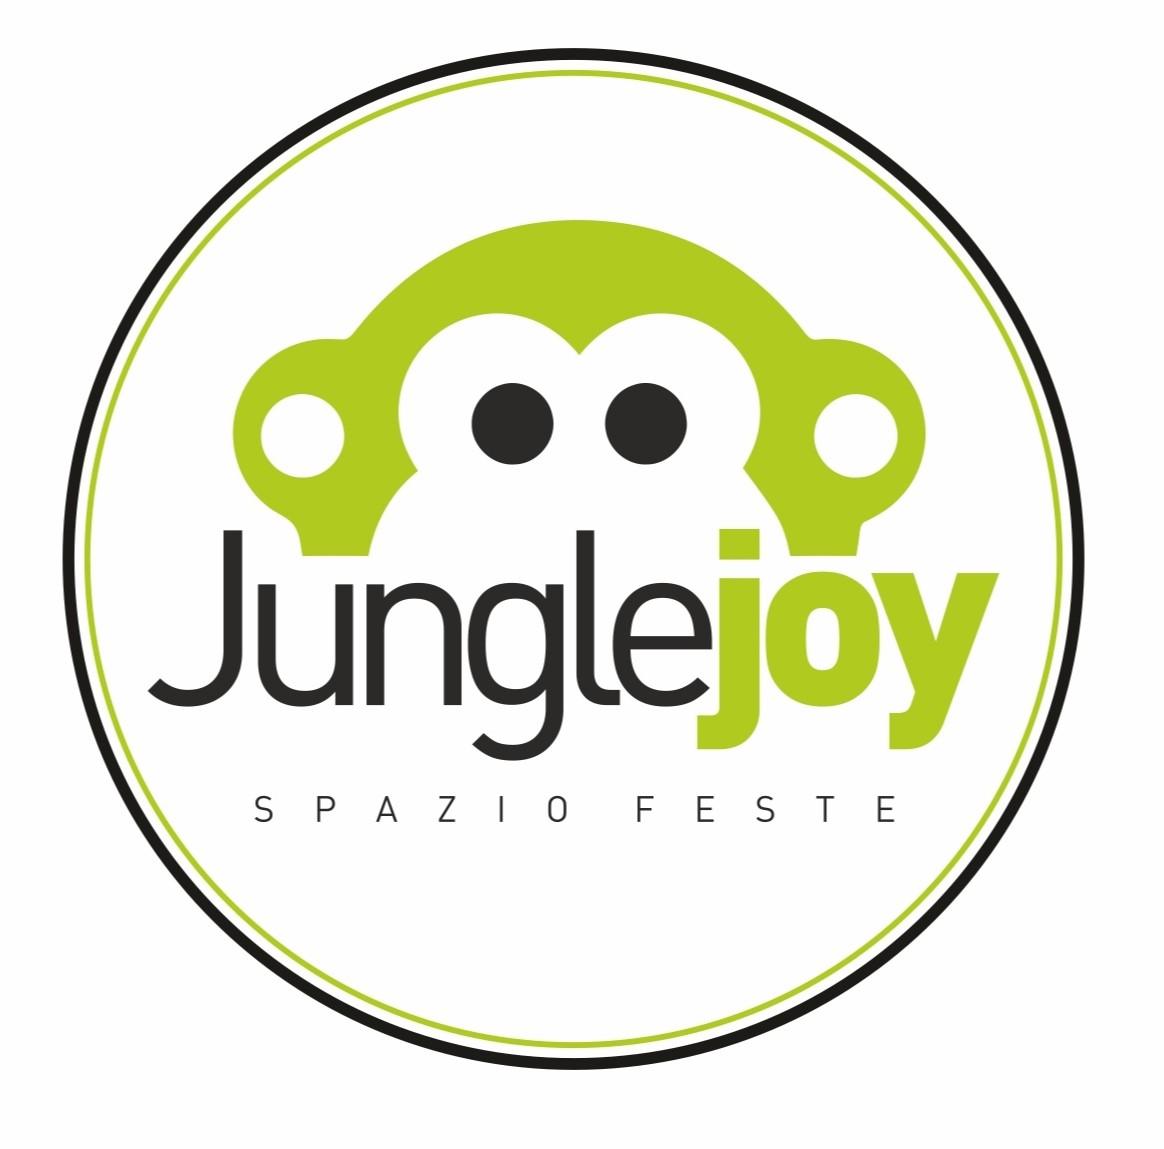 Jungle Joy